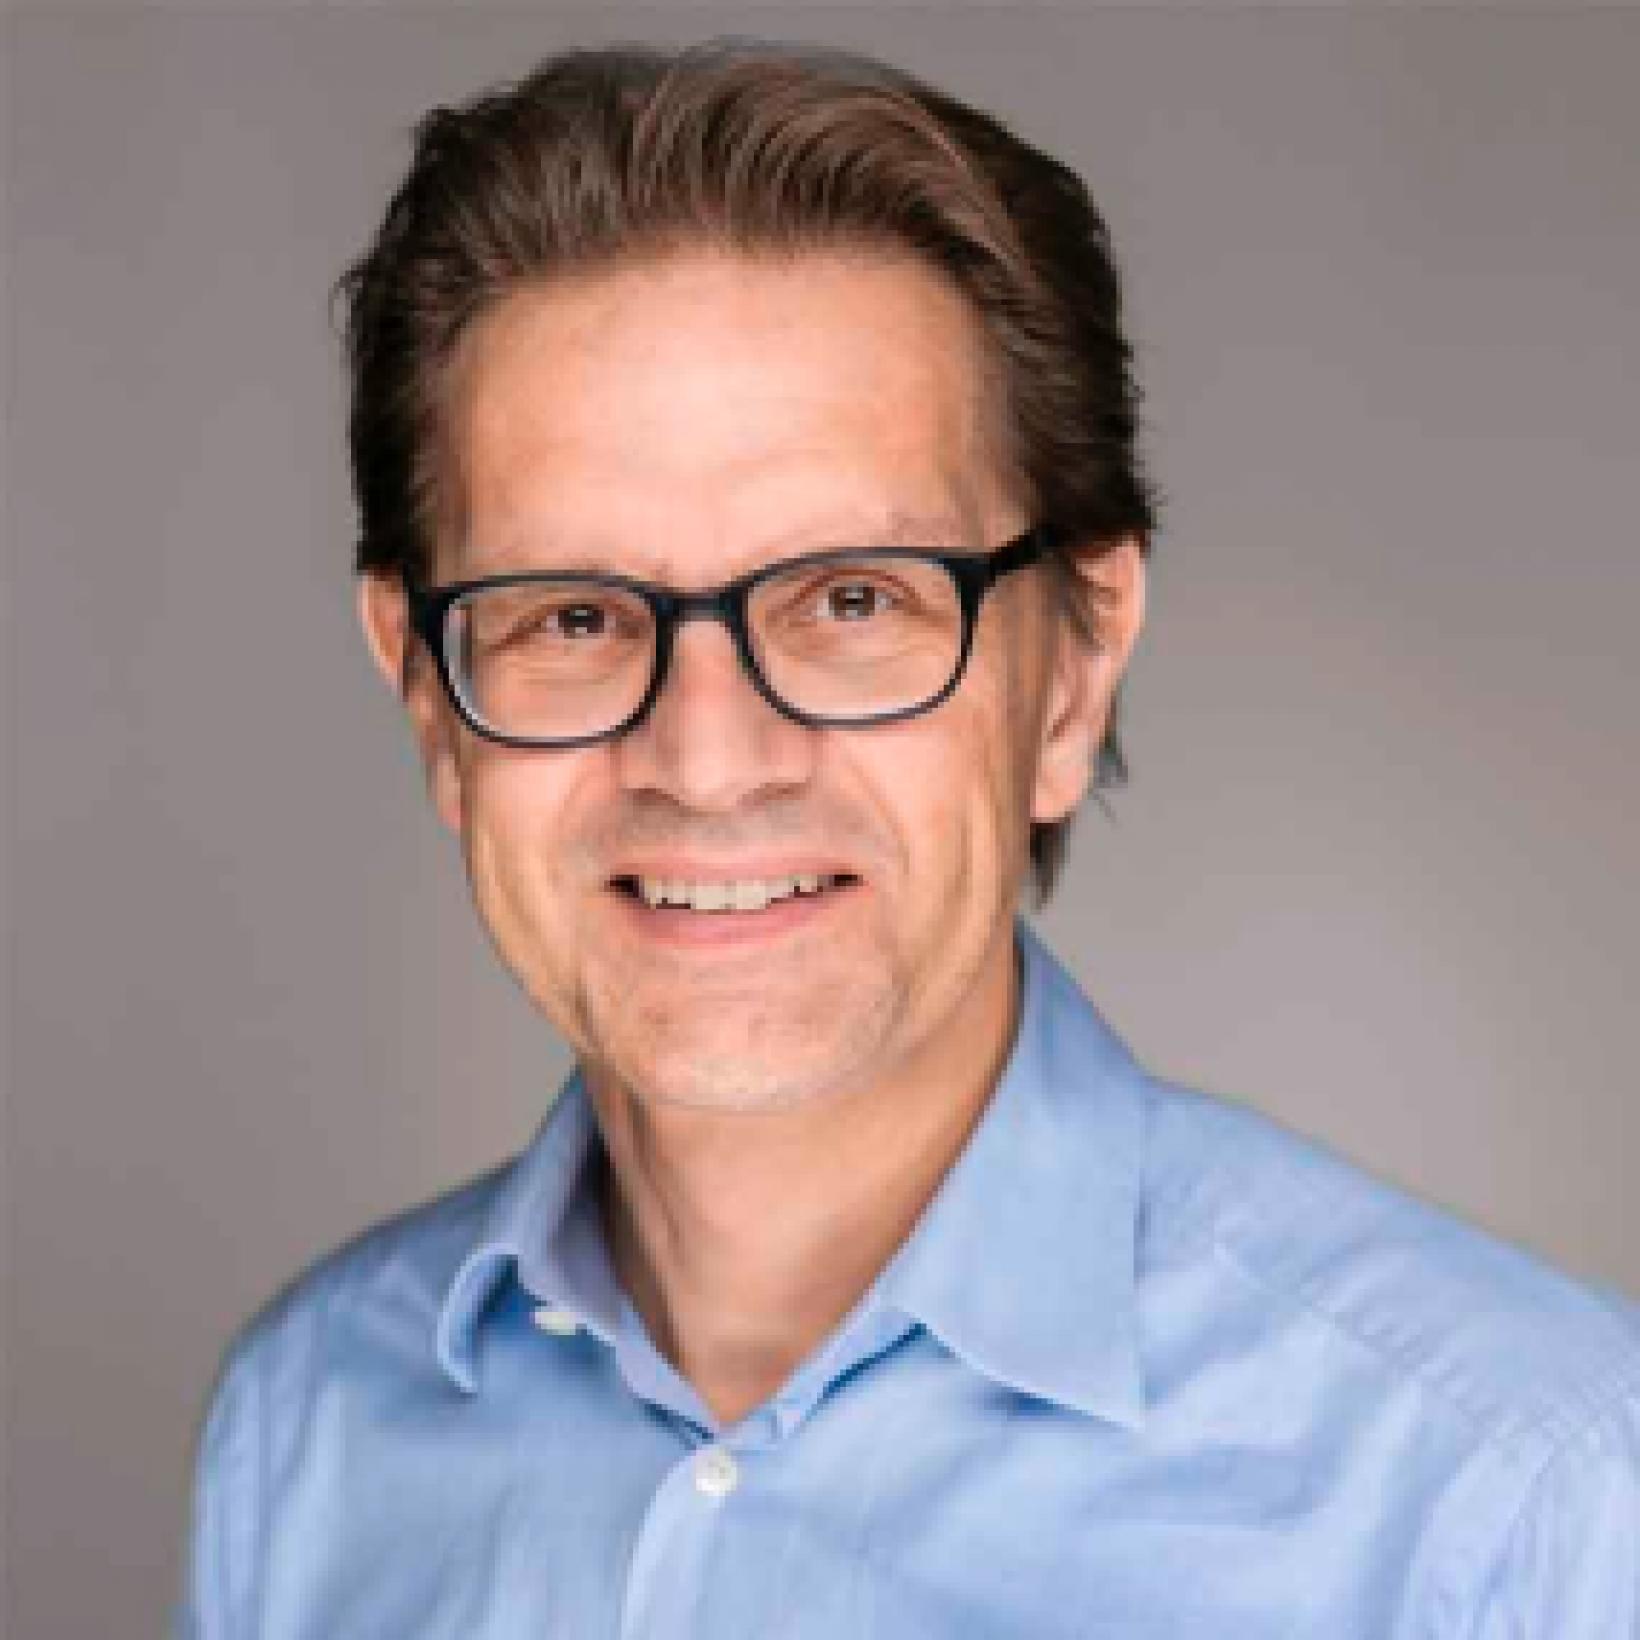 Torsten Tomczak